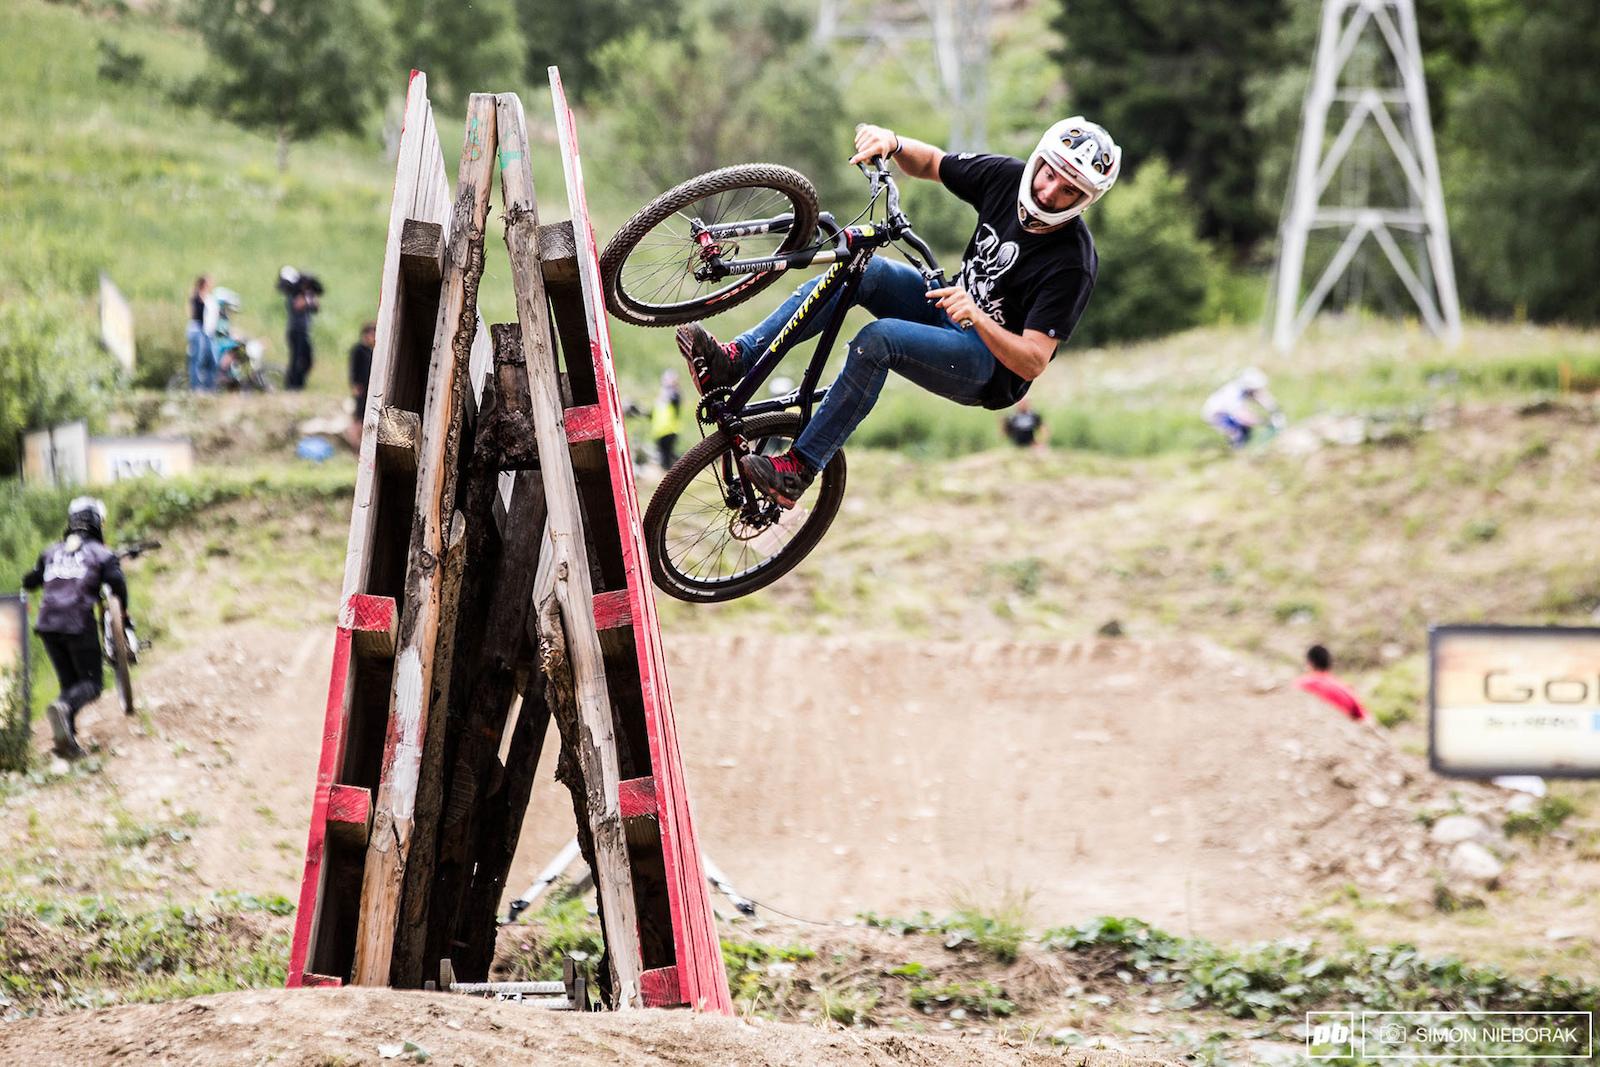 2014 Crankworx Les 2 Alpes - Speed and Style images